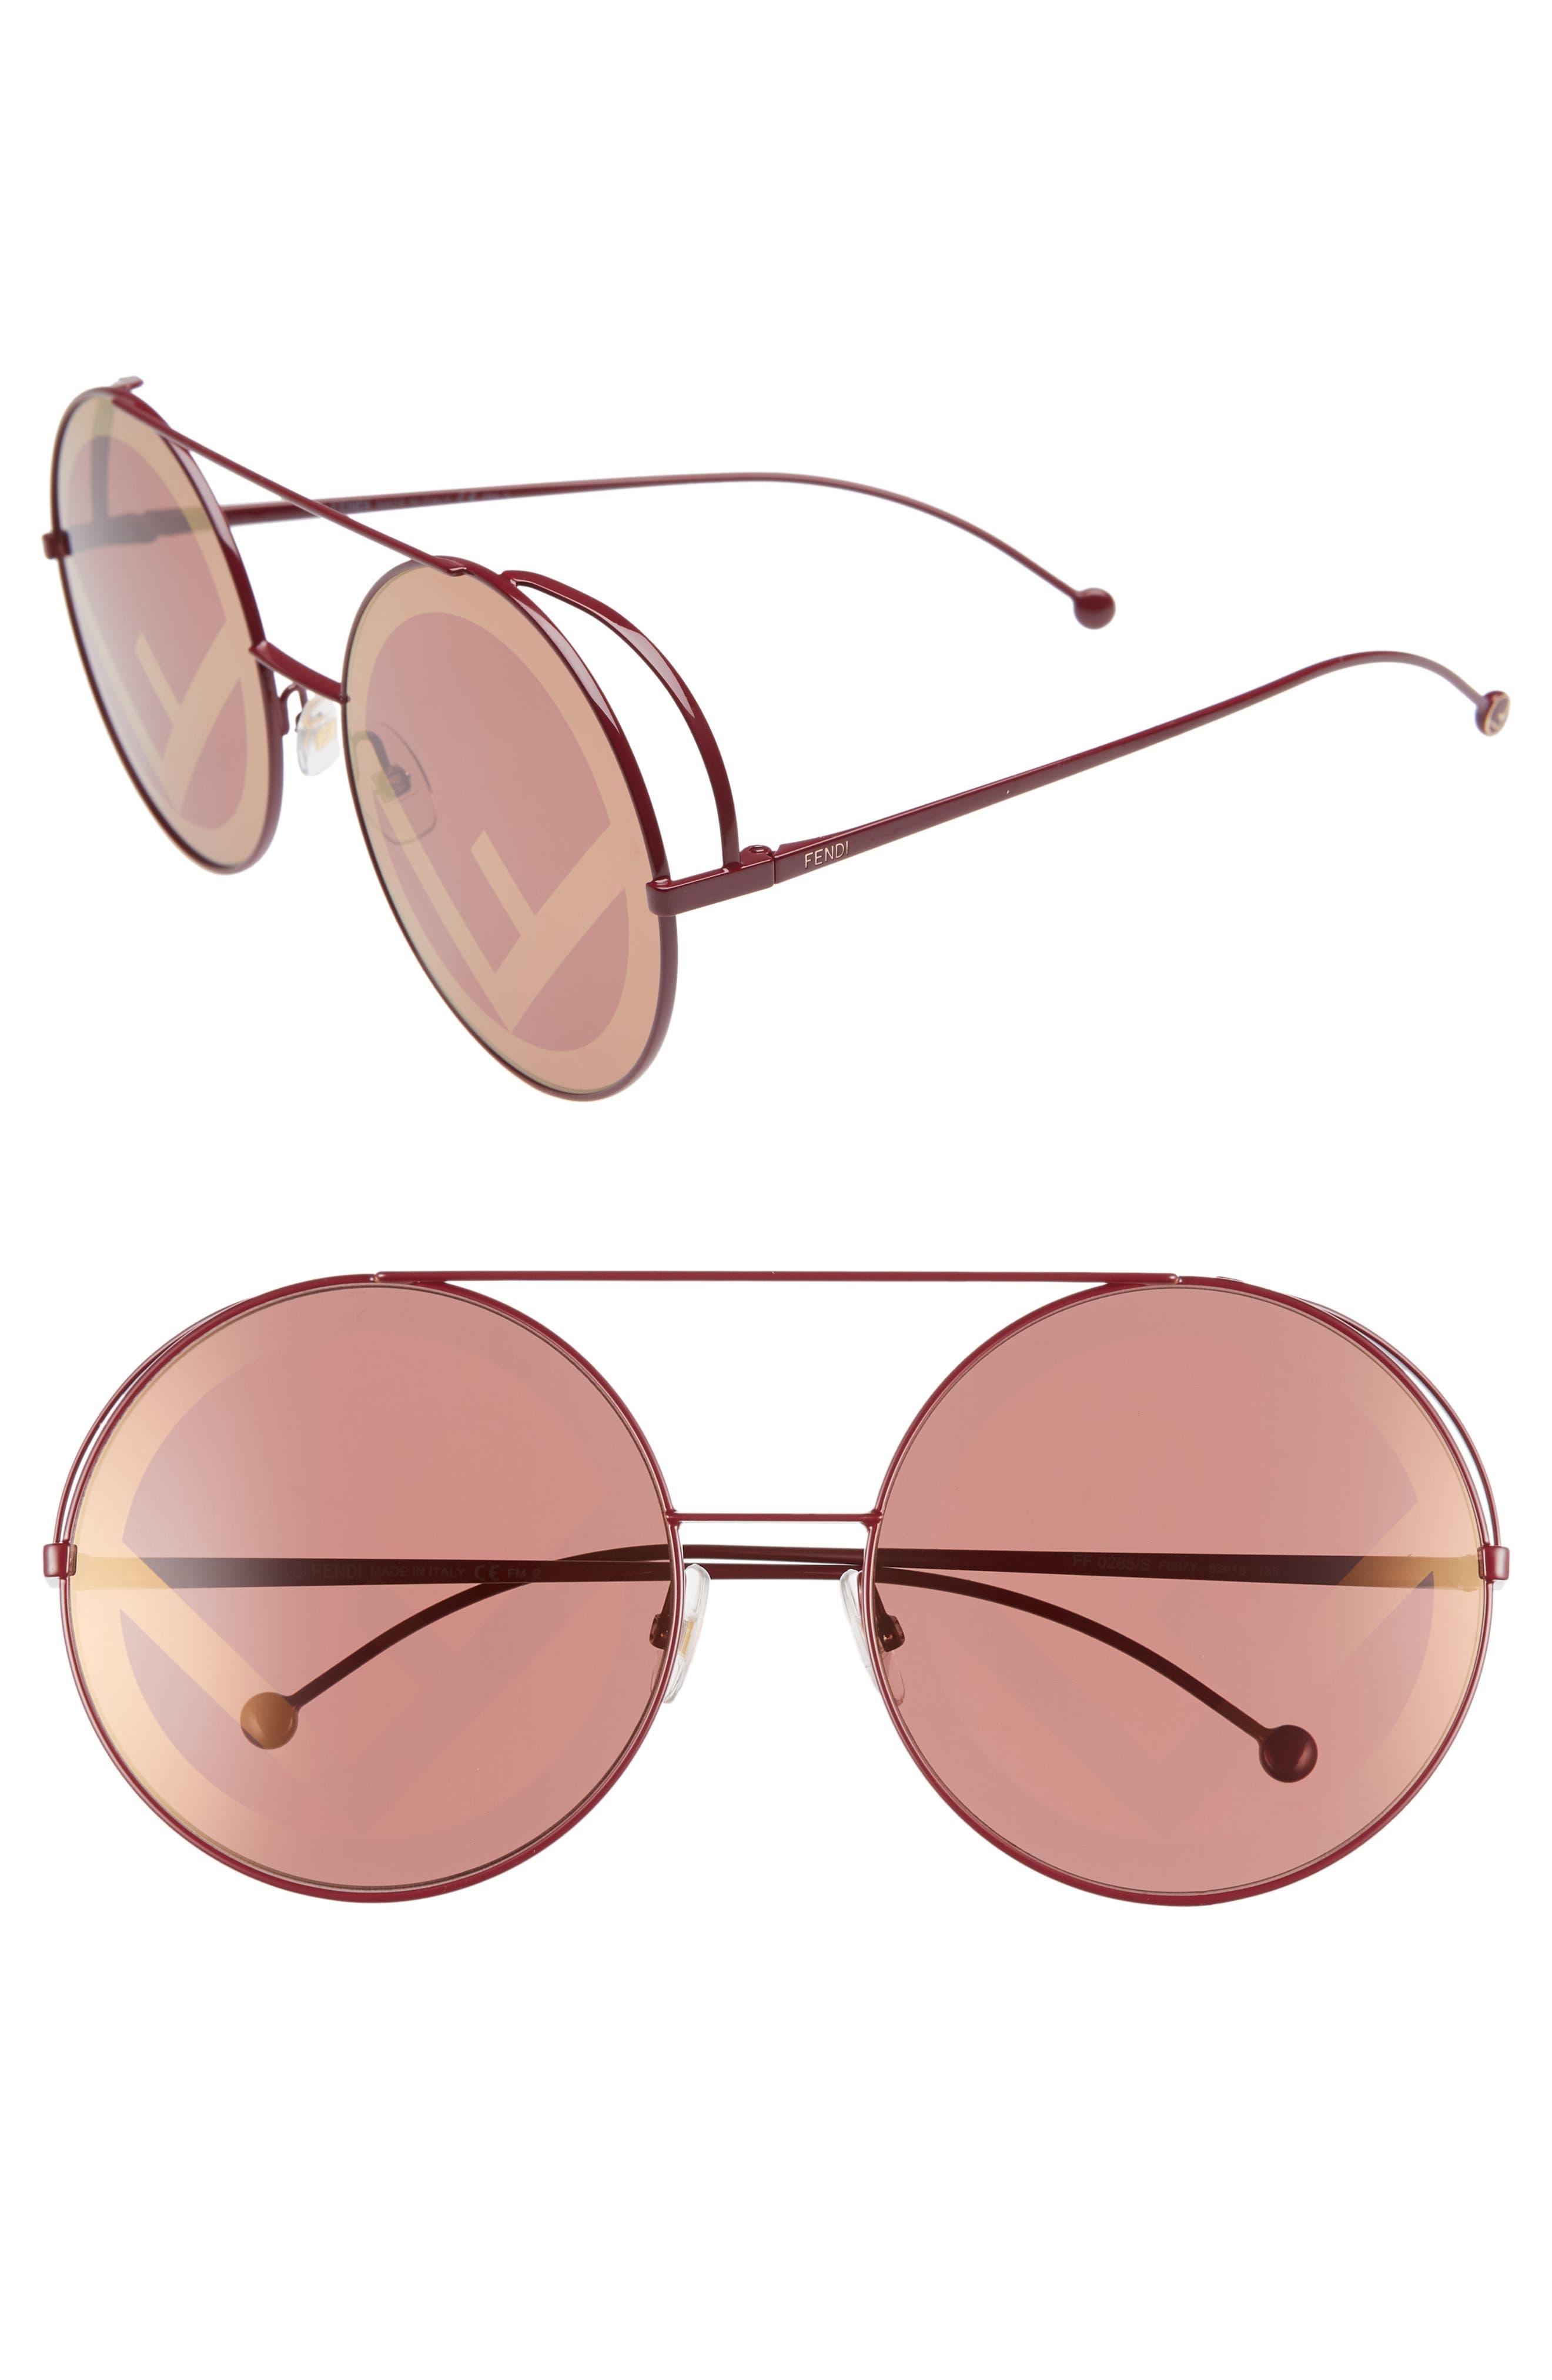 c1c0ee759824 Fendi Sunglasses for Women